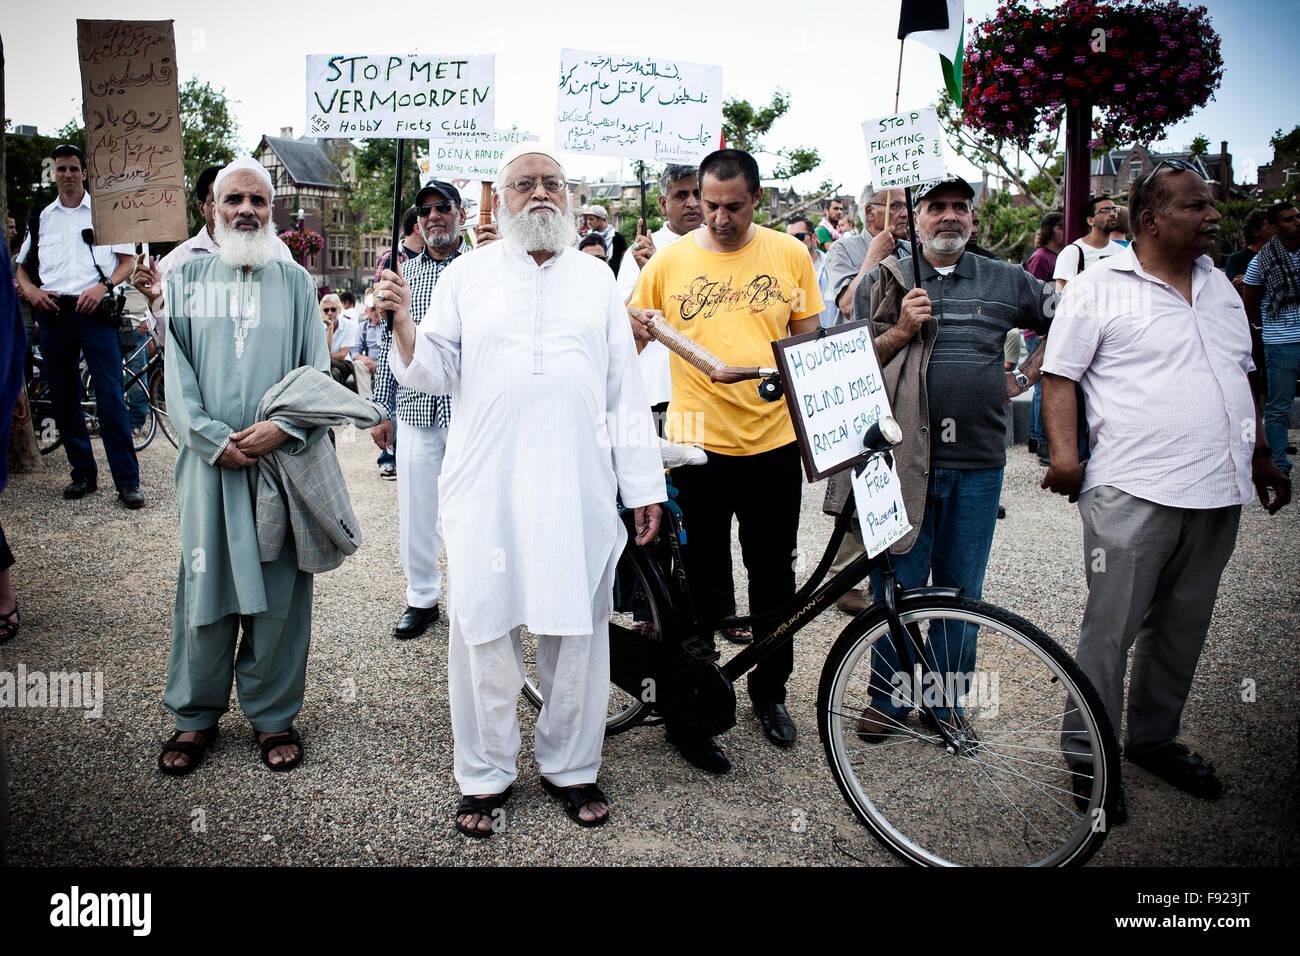 Amsterdam Demonstration Free Palestine 2014 - Stock Image